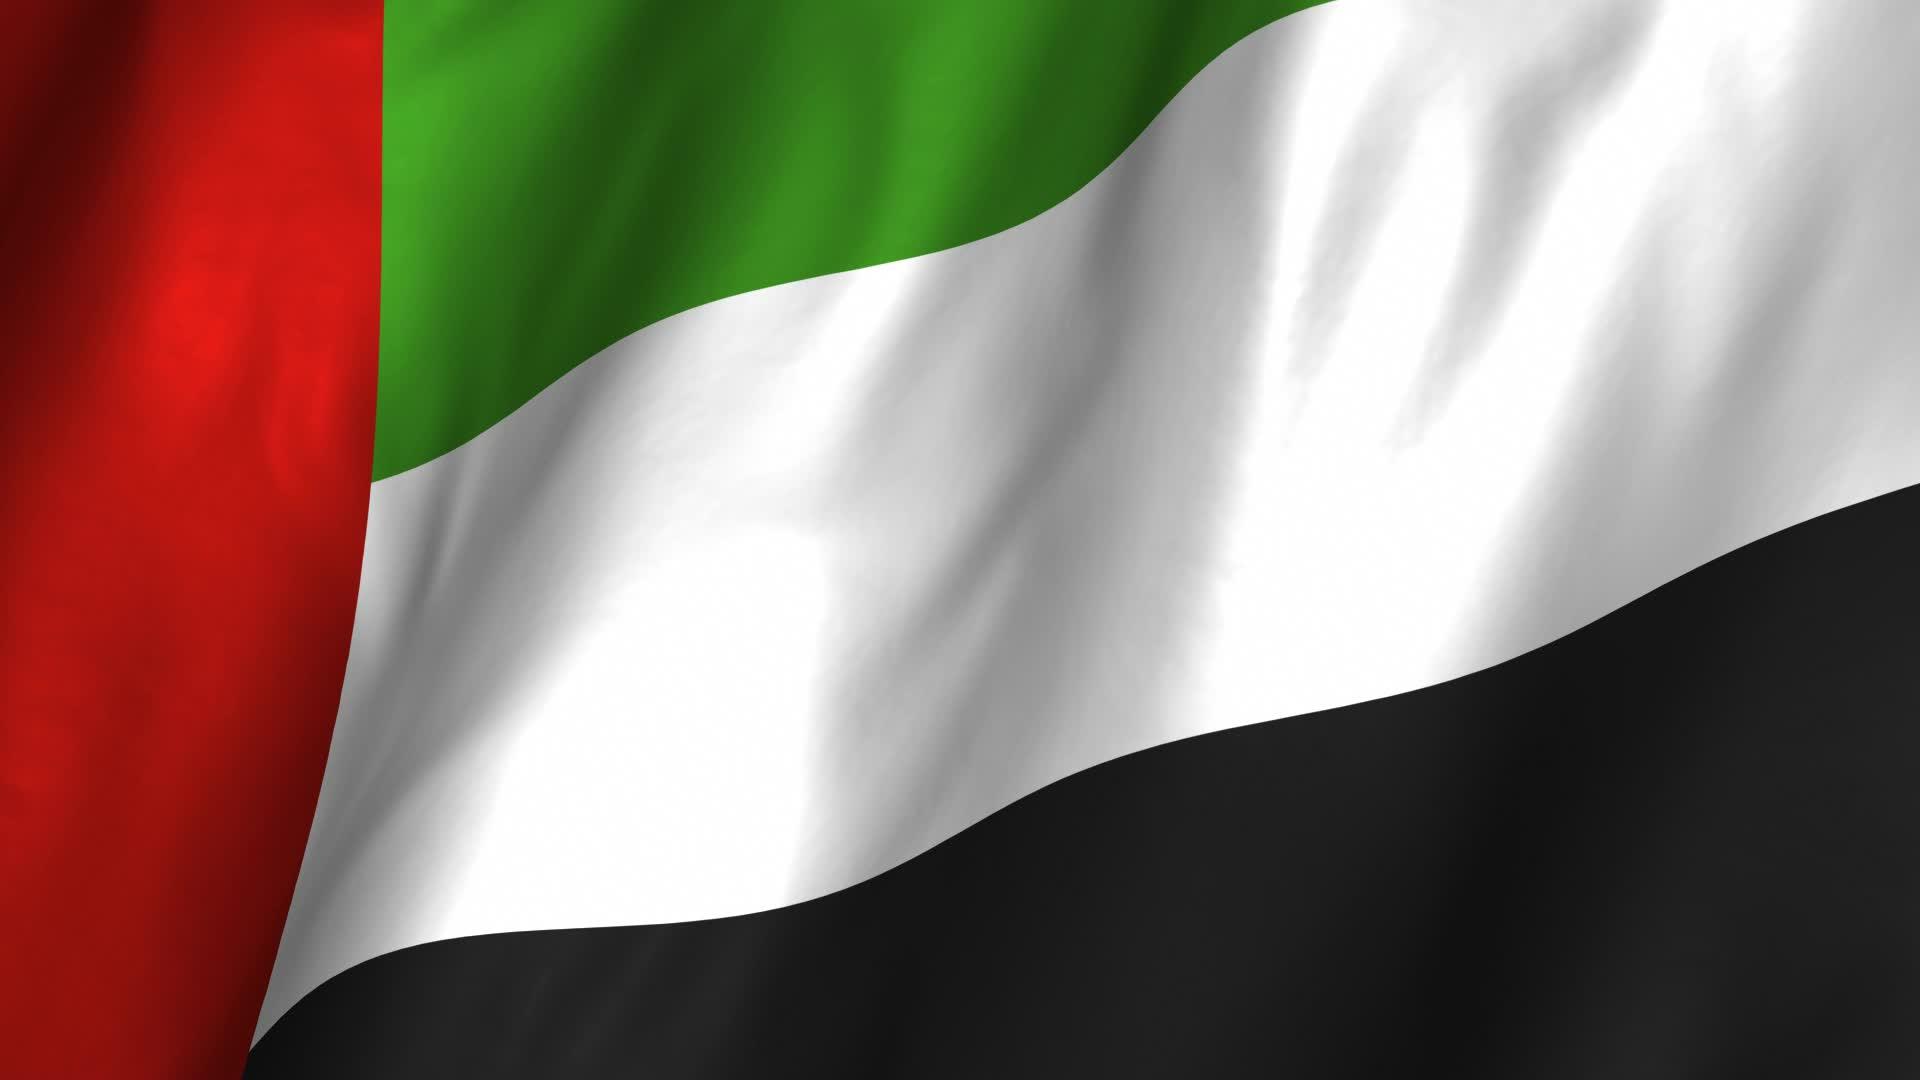 United Arab Emirates Waving Flag Stock Video 12367150 1920x1080